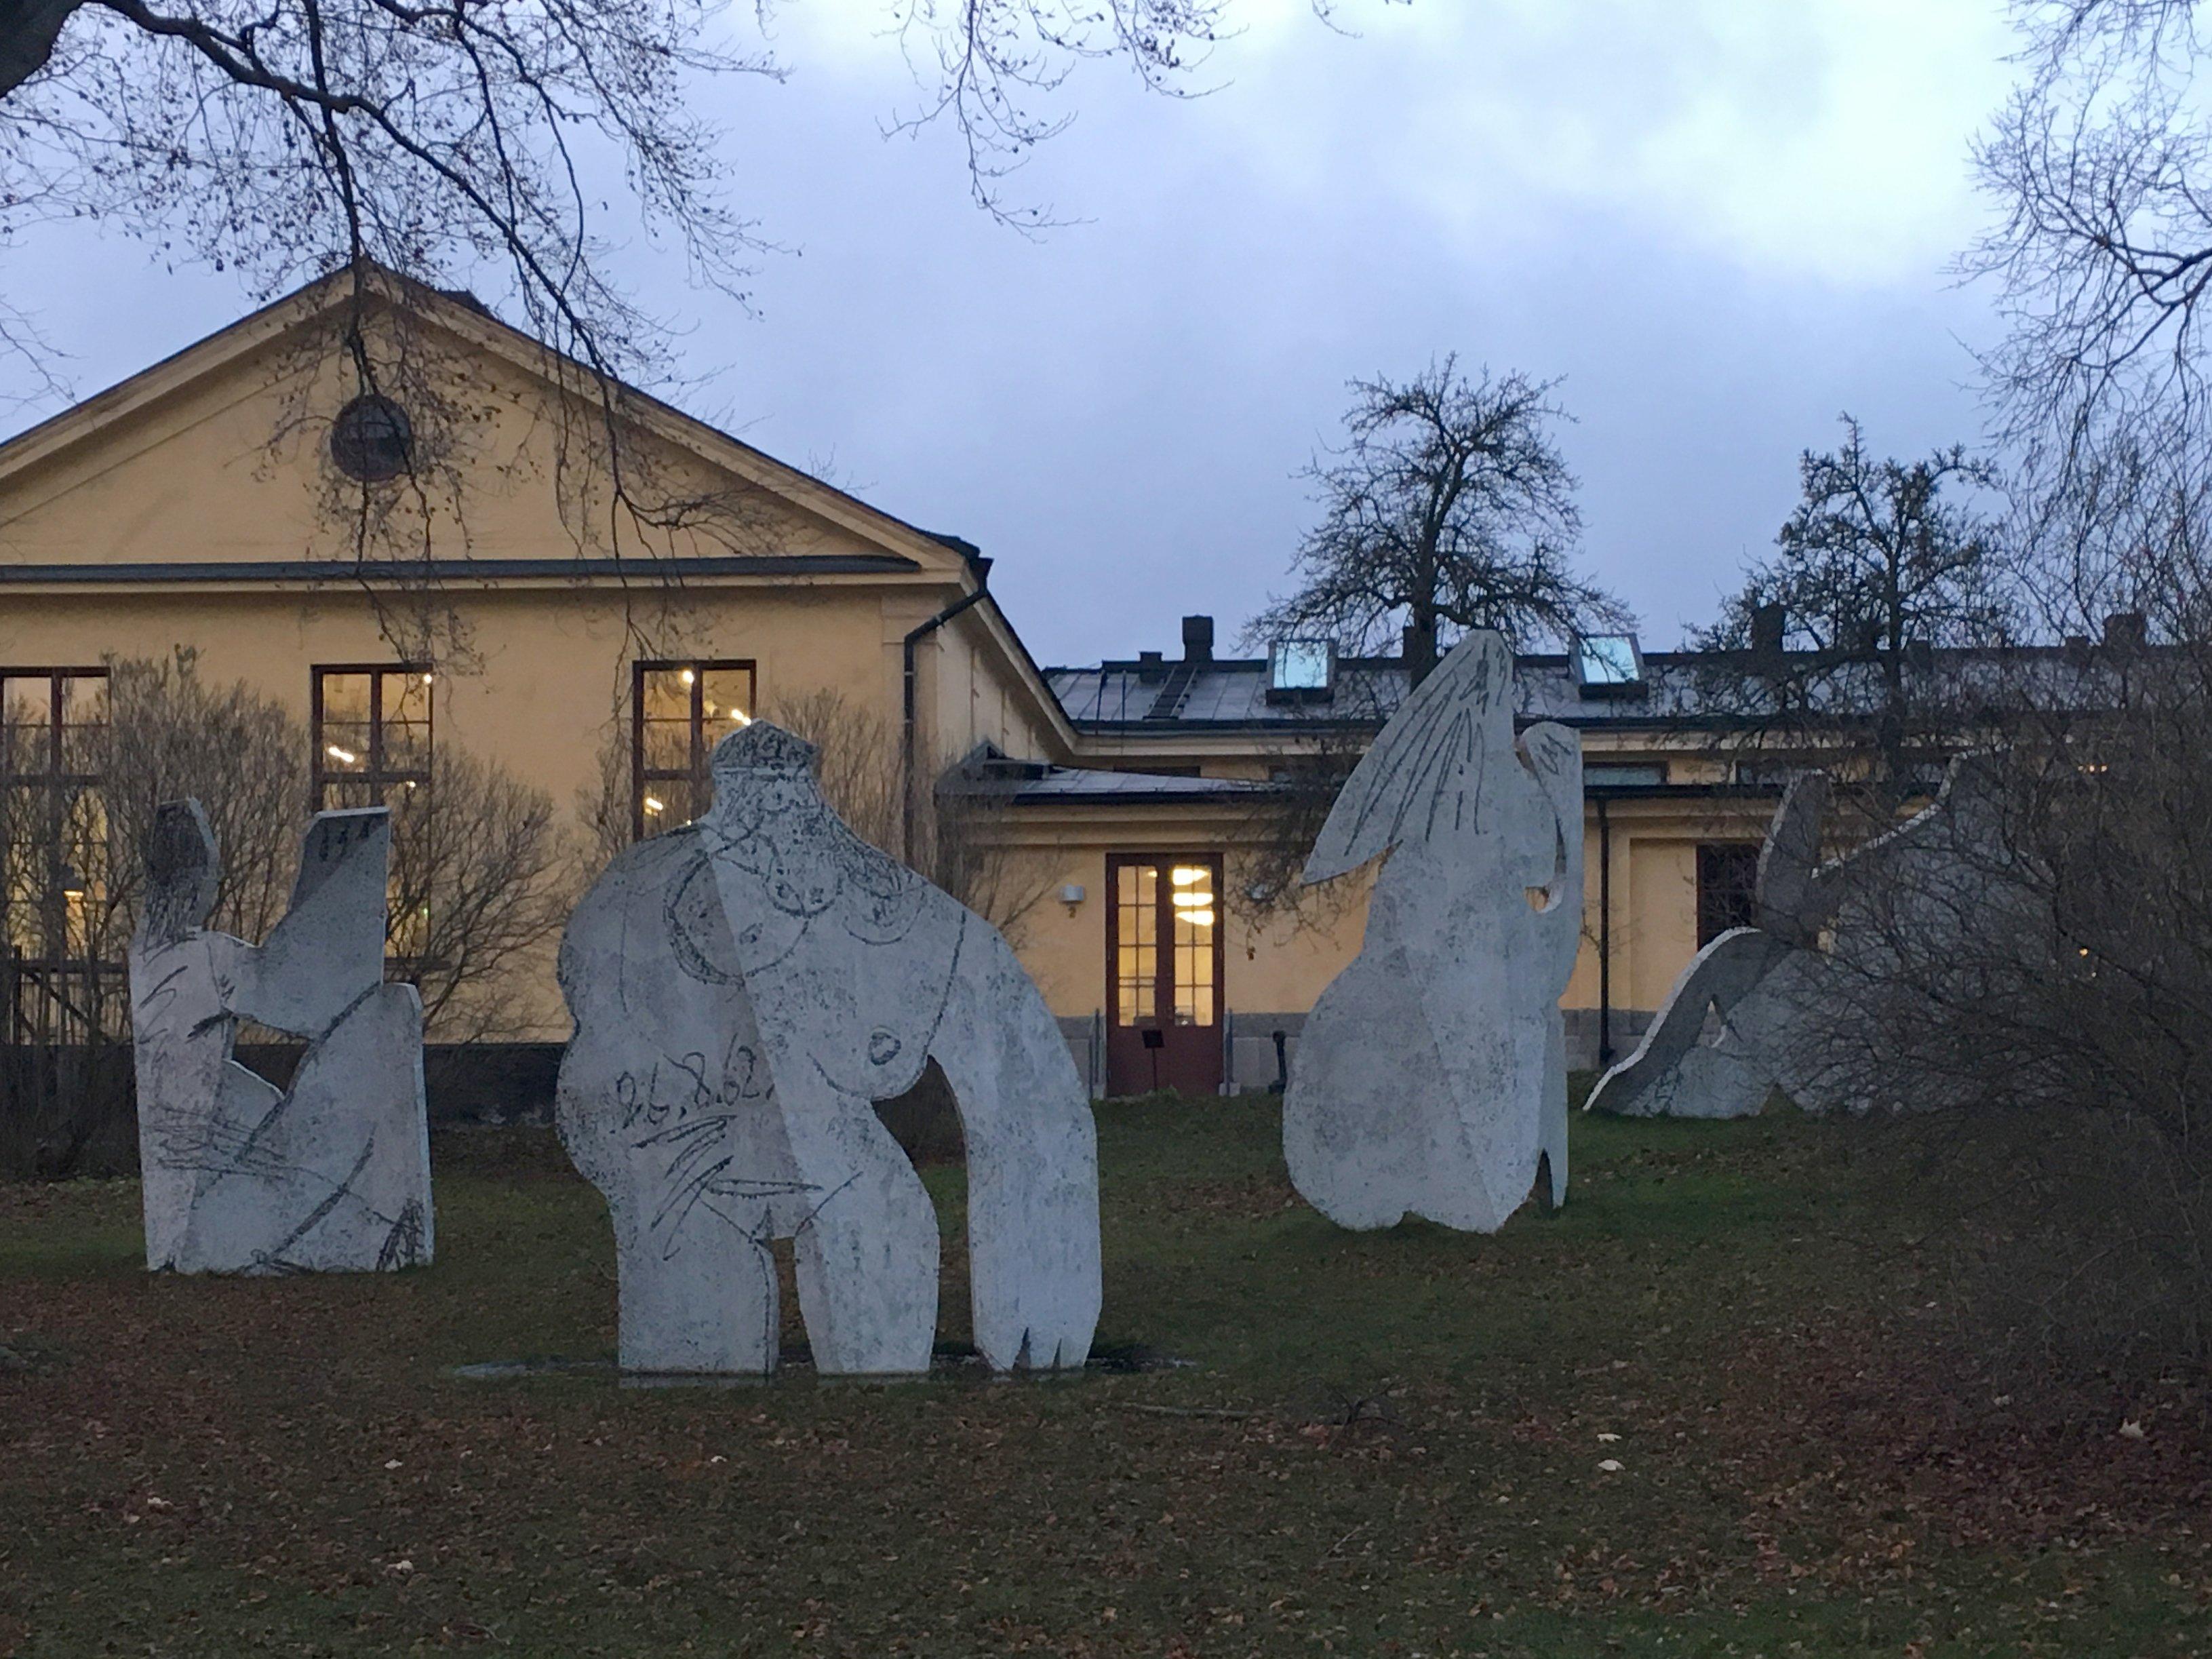 Memory works, Skeppsholmen